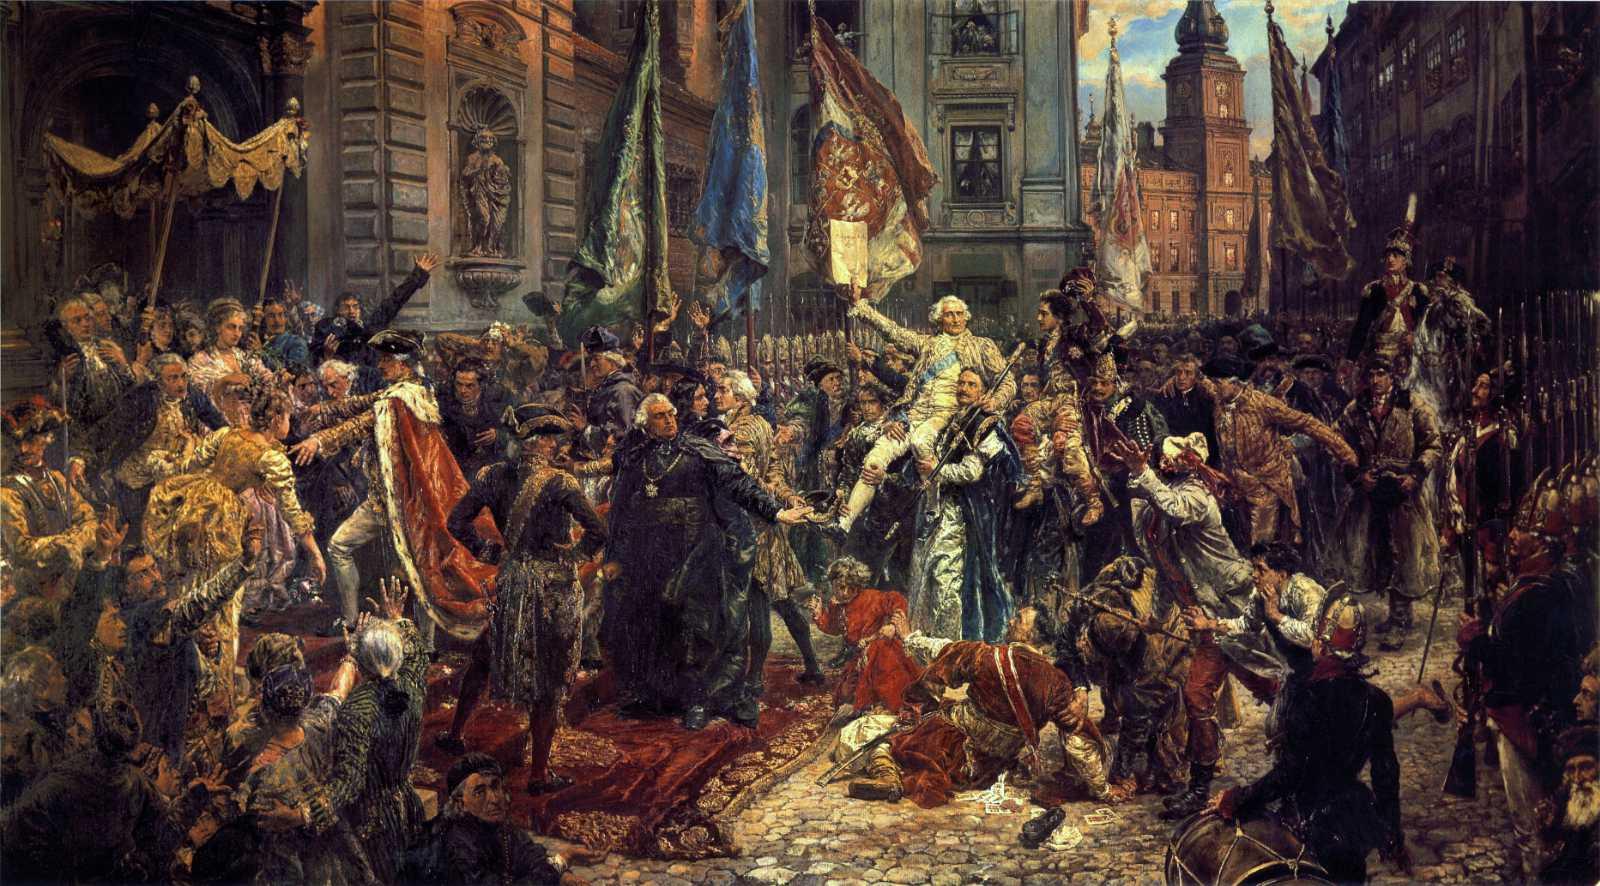 Verfassung vom 3. Mai. Quelle Wikimedia, Konstytucja_3_Maja.jpg